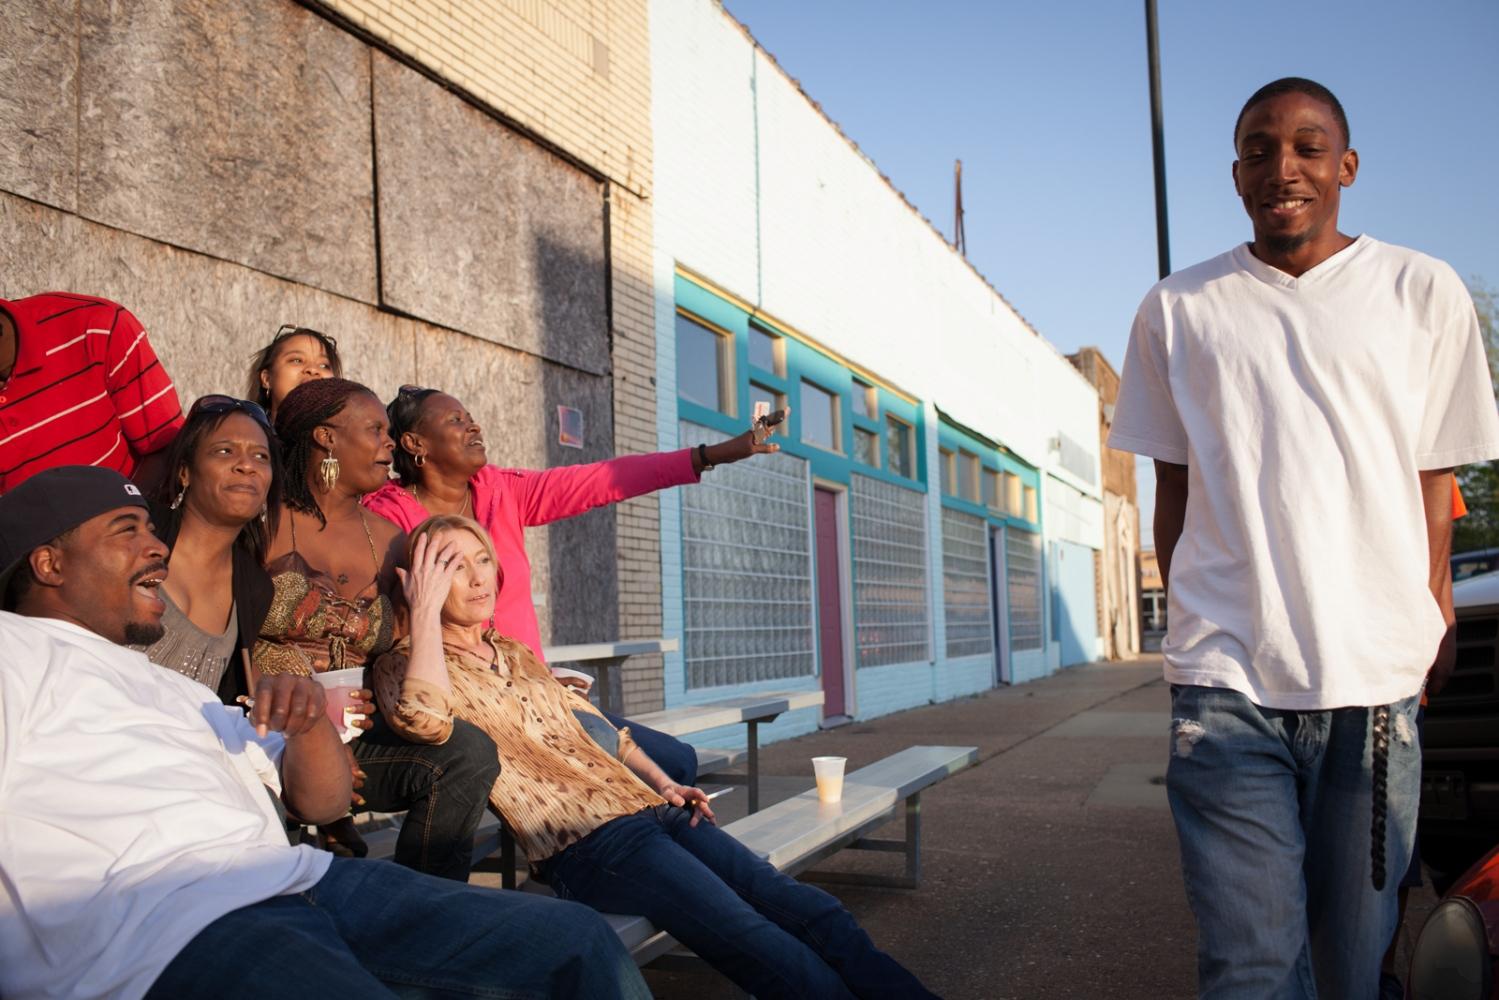 Art and Documentary Photography - Loading Juke_LindsayMorris_2011-1110.jpg